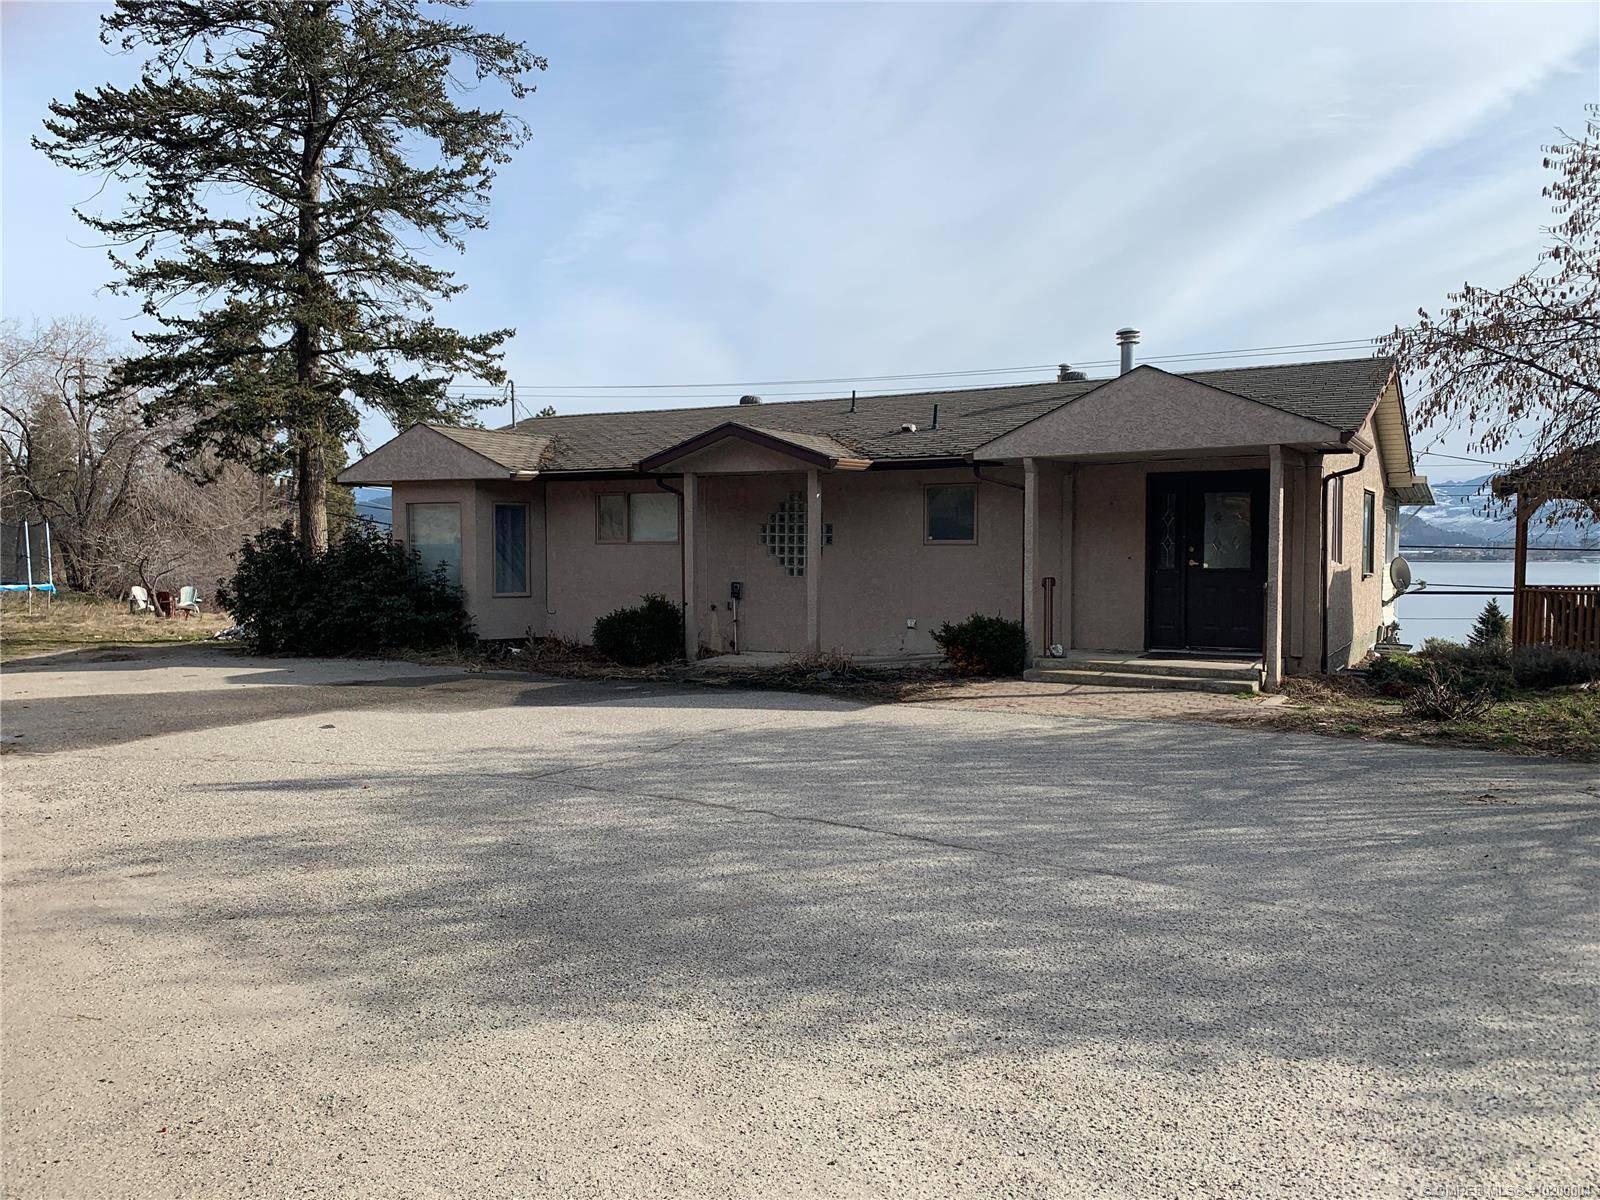 House for sale at 1595 Bear Creek Rd Unit 1595 Kelowna British Columbia - MLS: 10200004